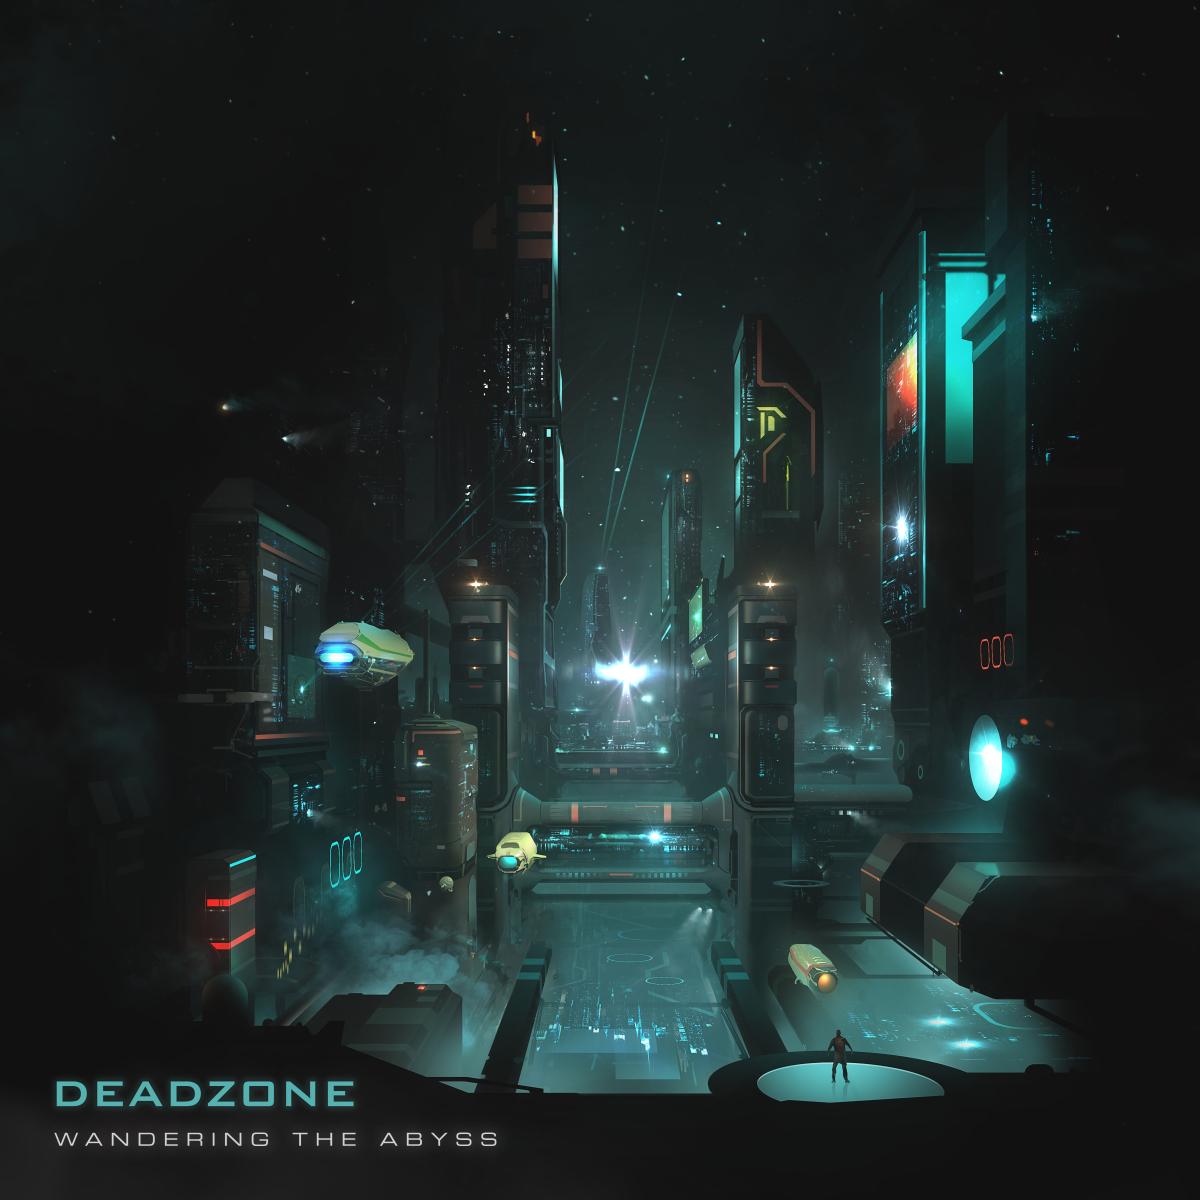 Deadzone - Wandering The Abyss (ALBUM ARTWORK)